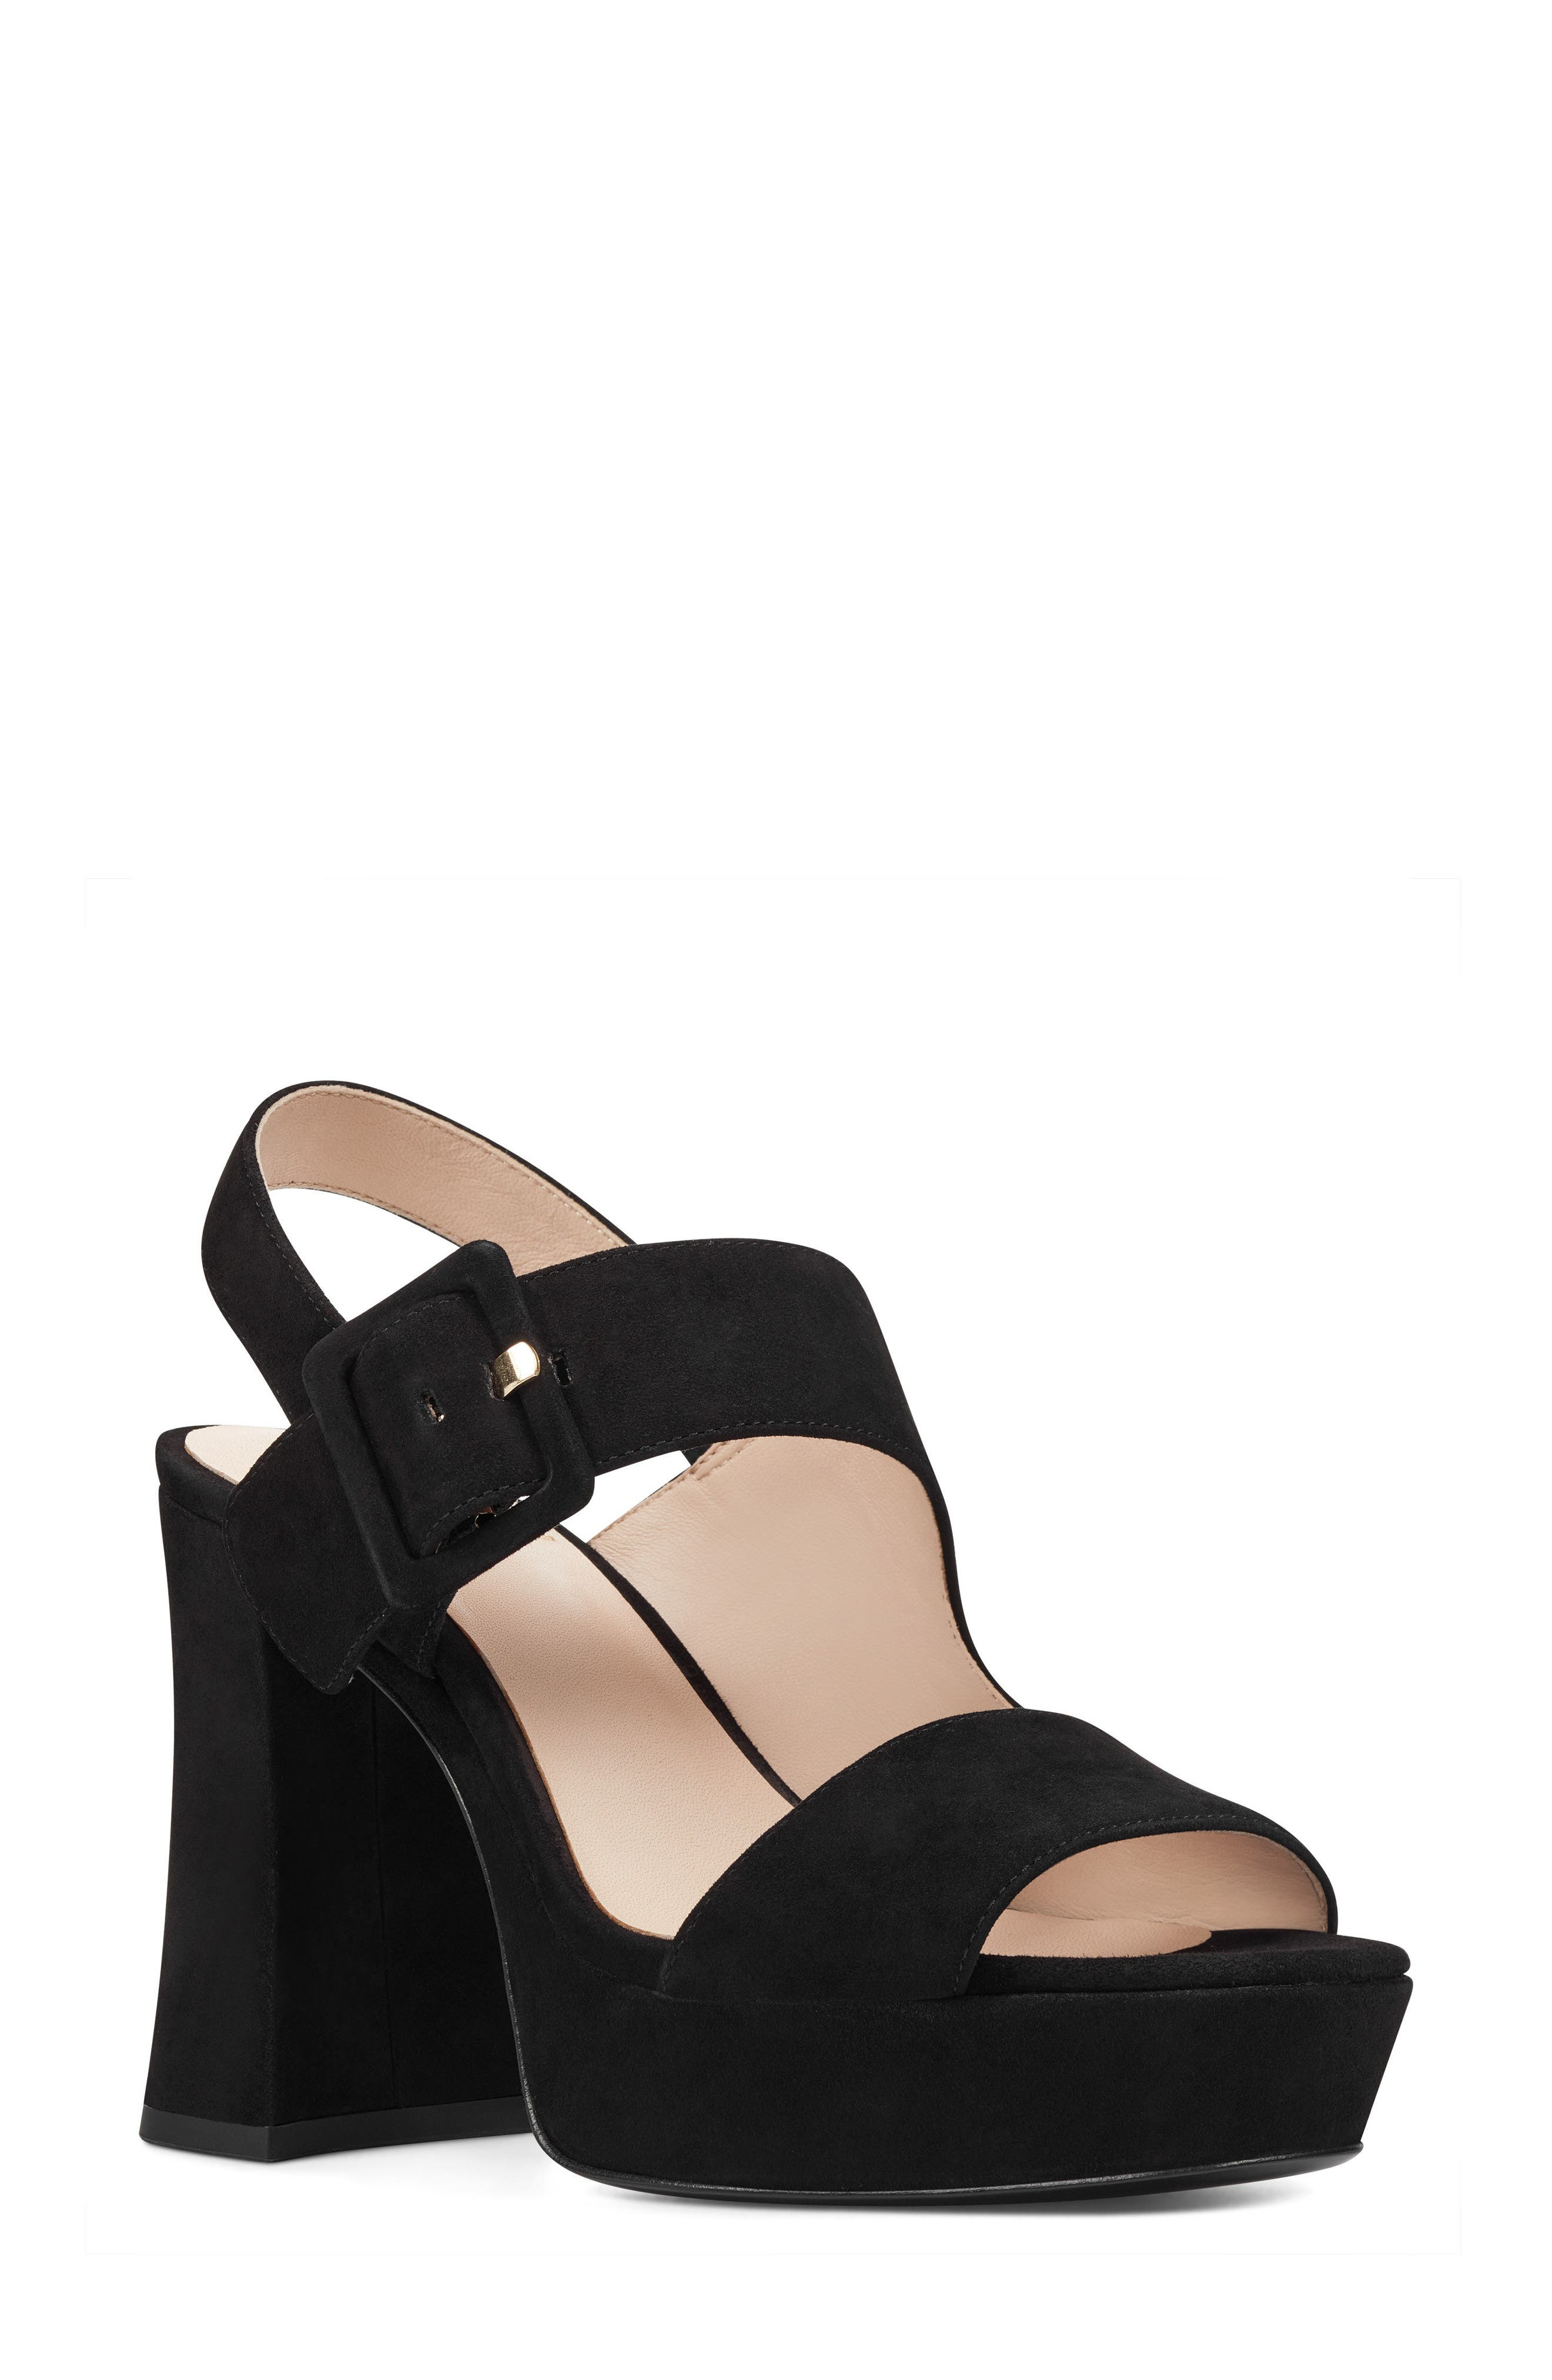 Lexine - 40th Anniversary Capsule Collection Platform Sandal,                         Main,                         color, BLACK LEATHER